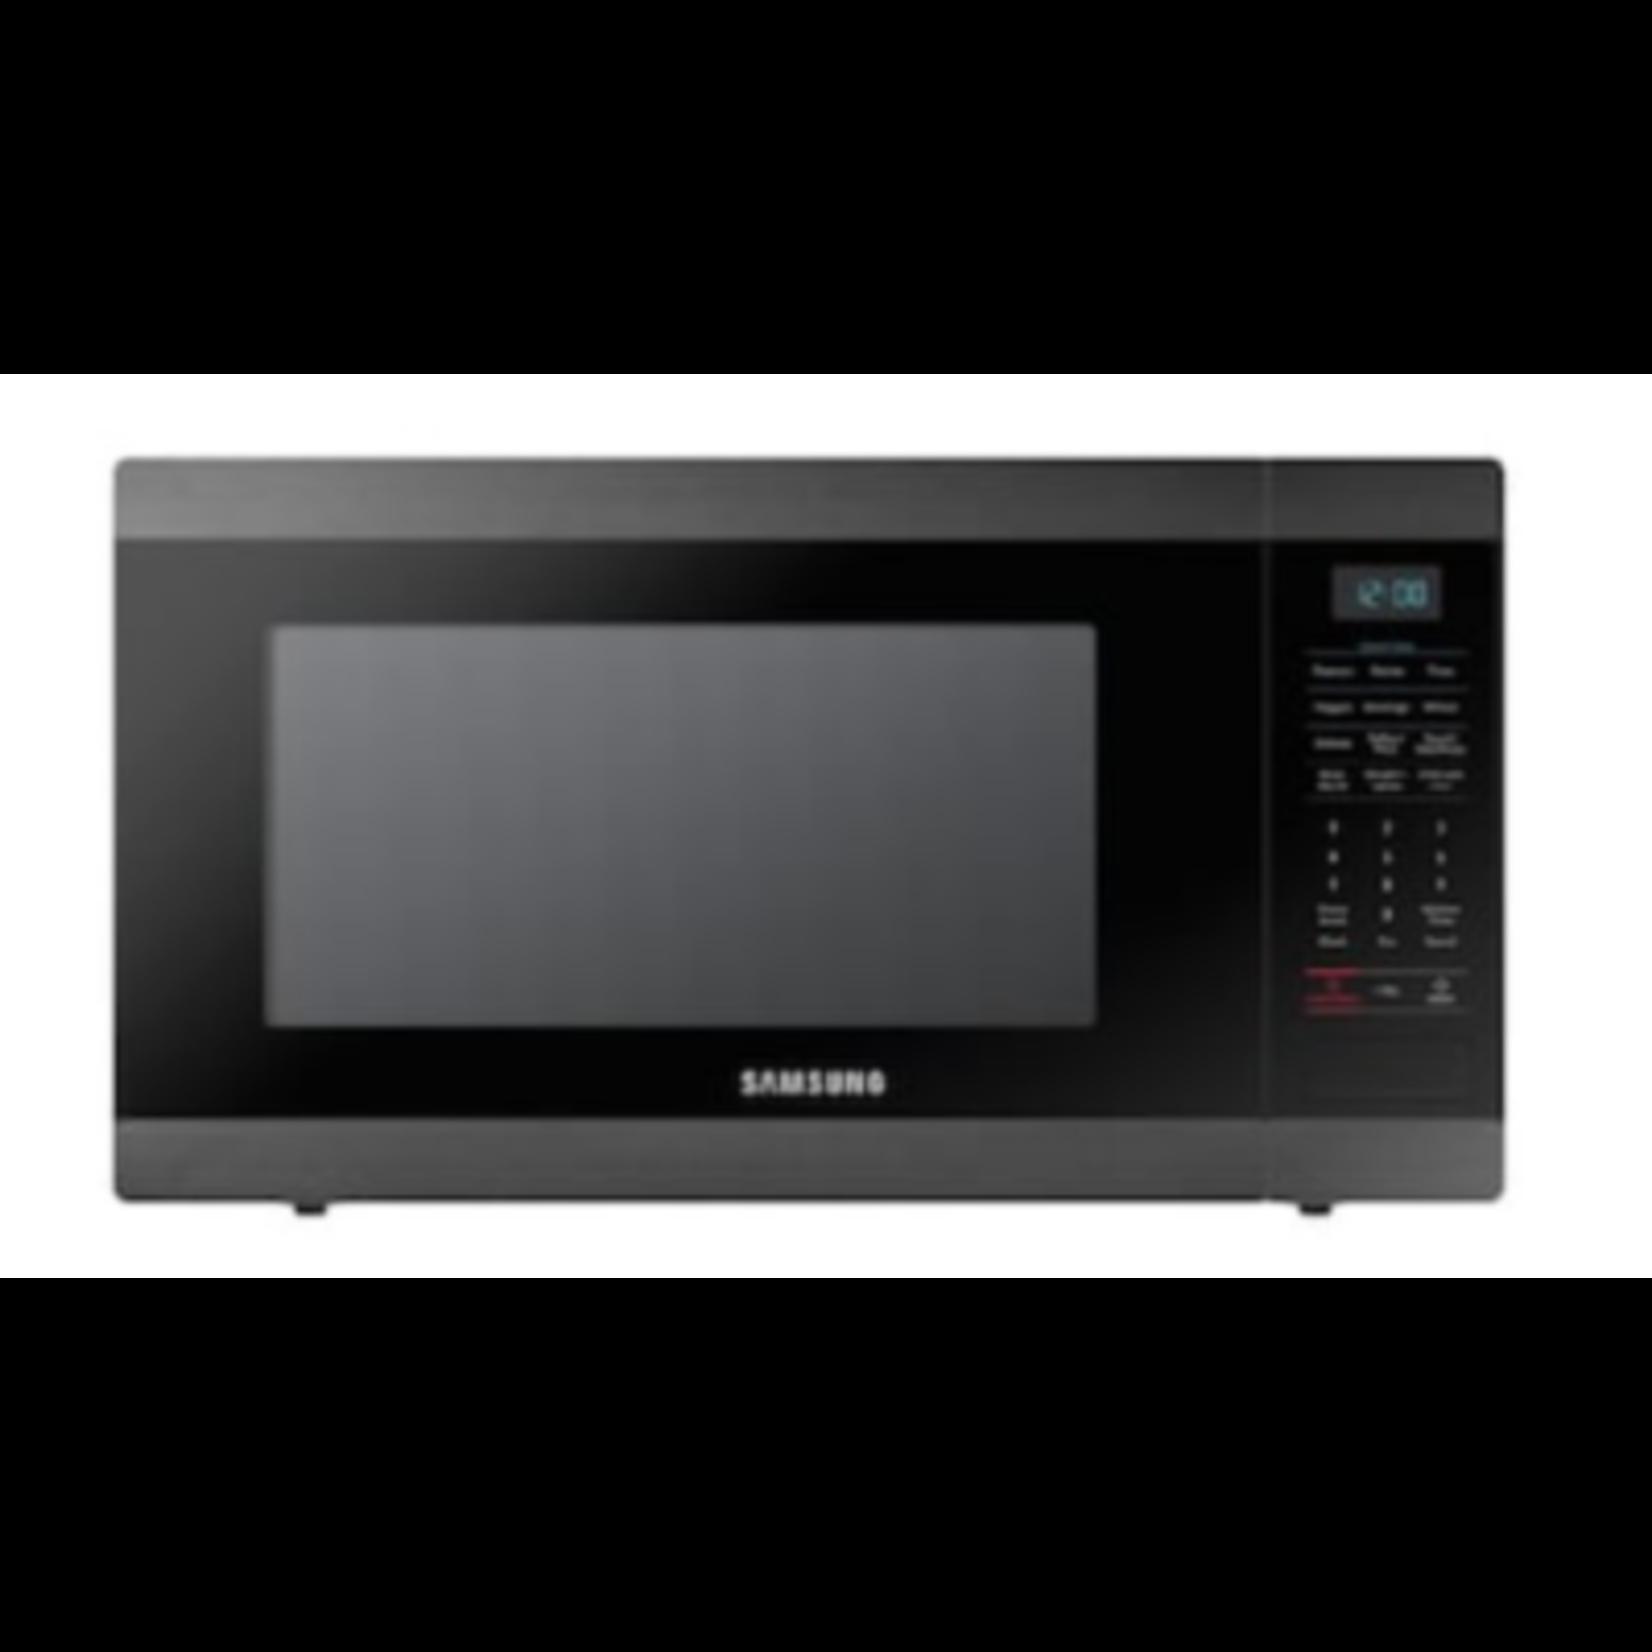 1558 Samsung Black Stainless Steel Countertop Microwave